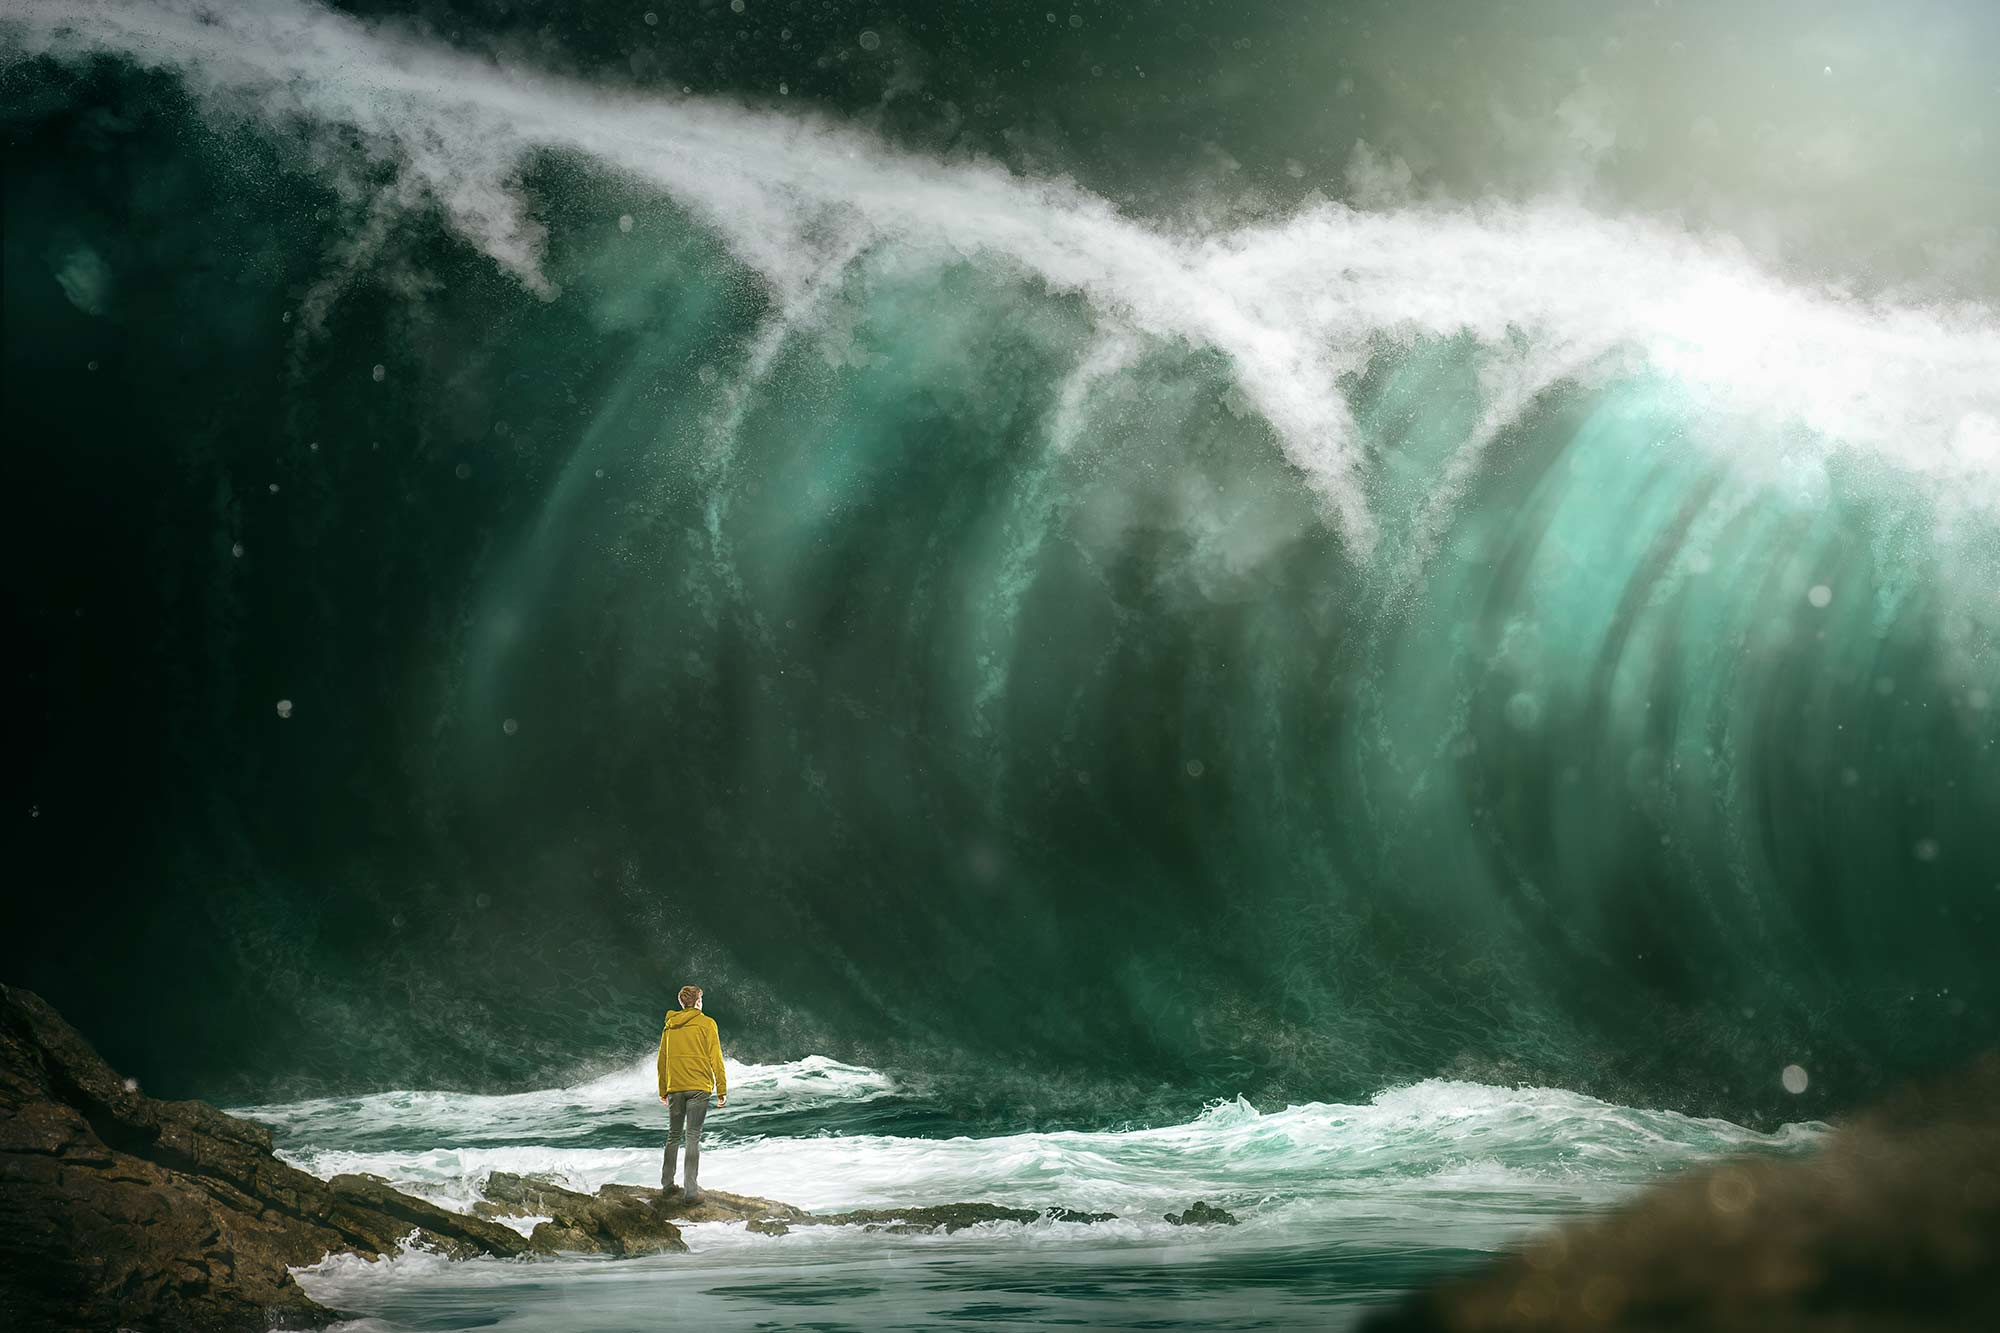 man-wave